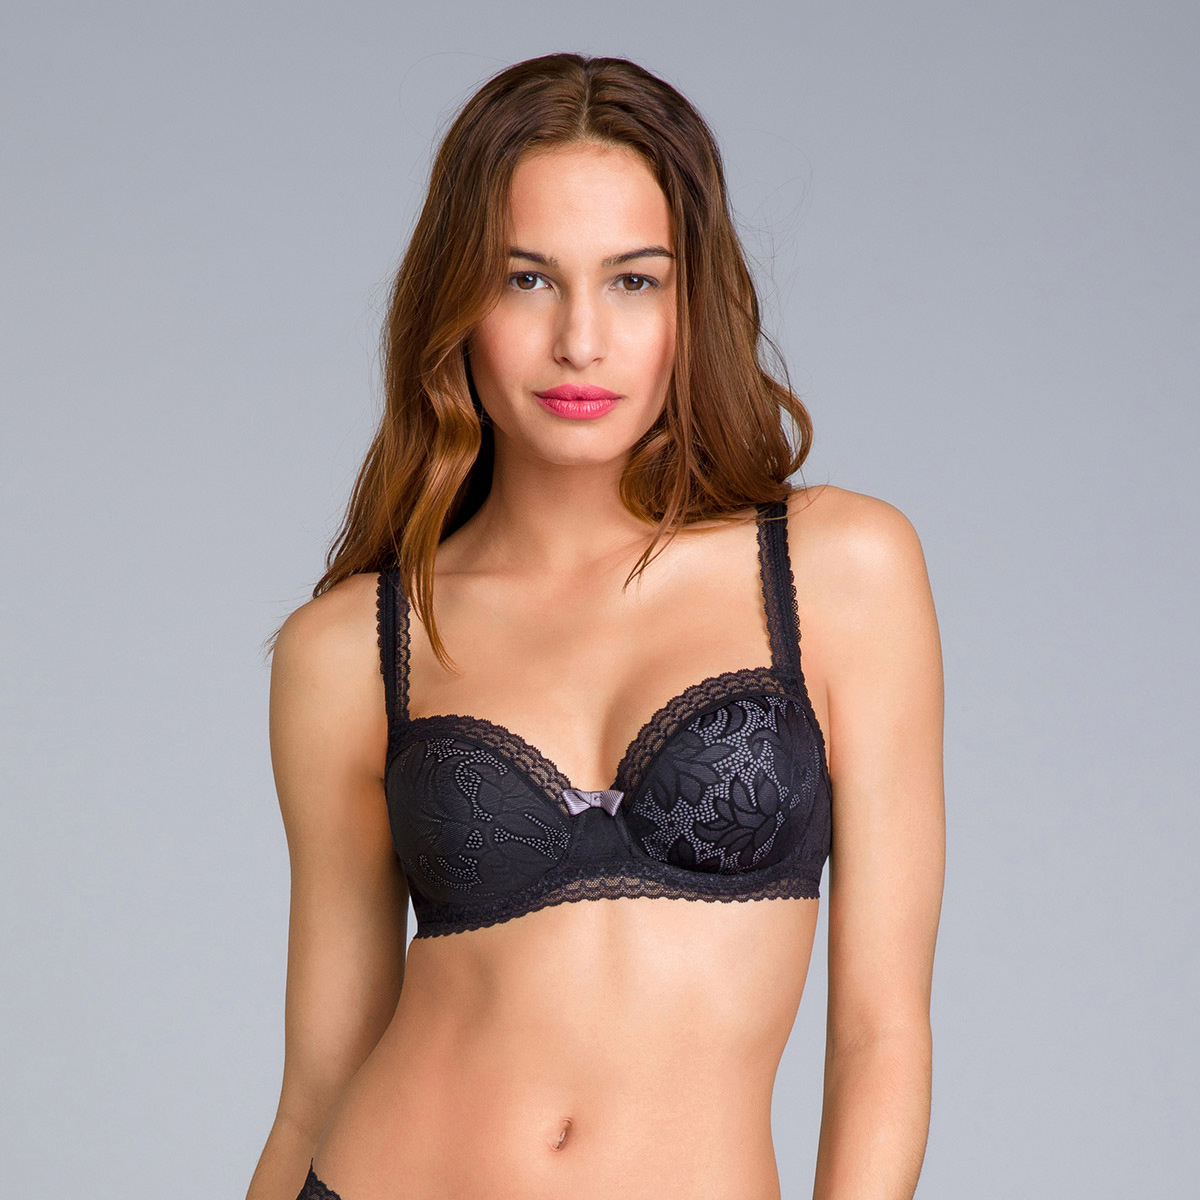 Balcony Bra in Black Lace - Invisible Elegance, , PLAYTEX